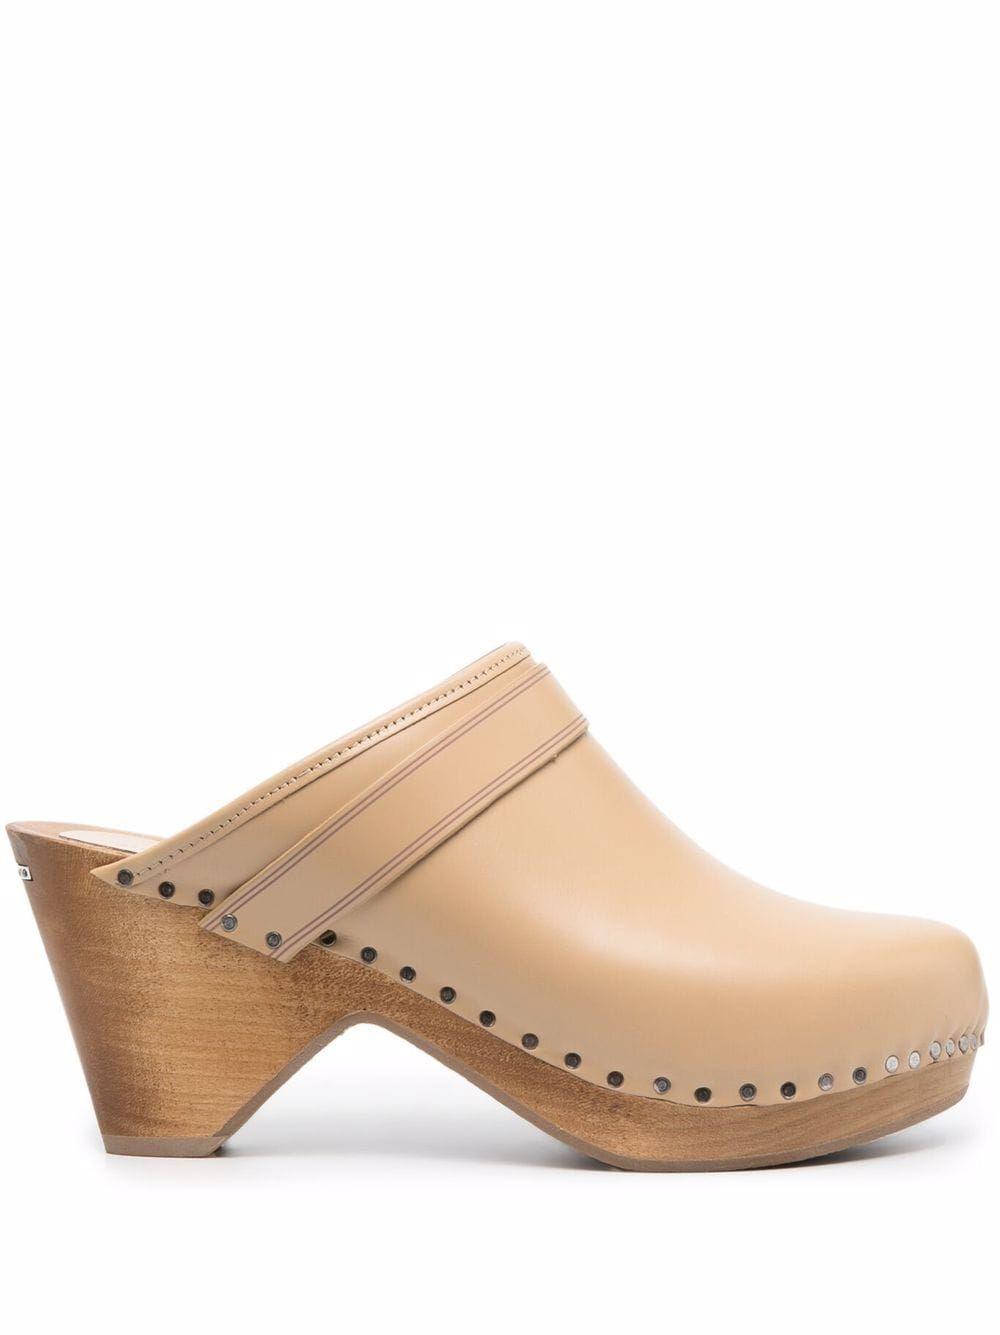 Sandalo tholas in pelle